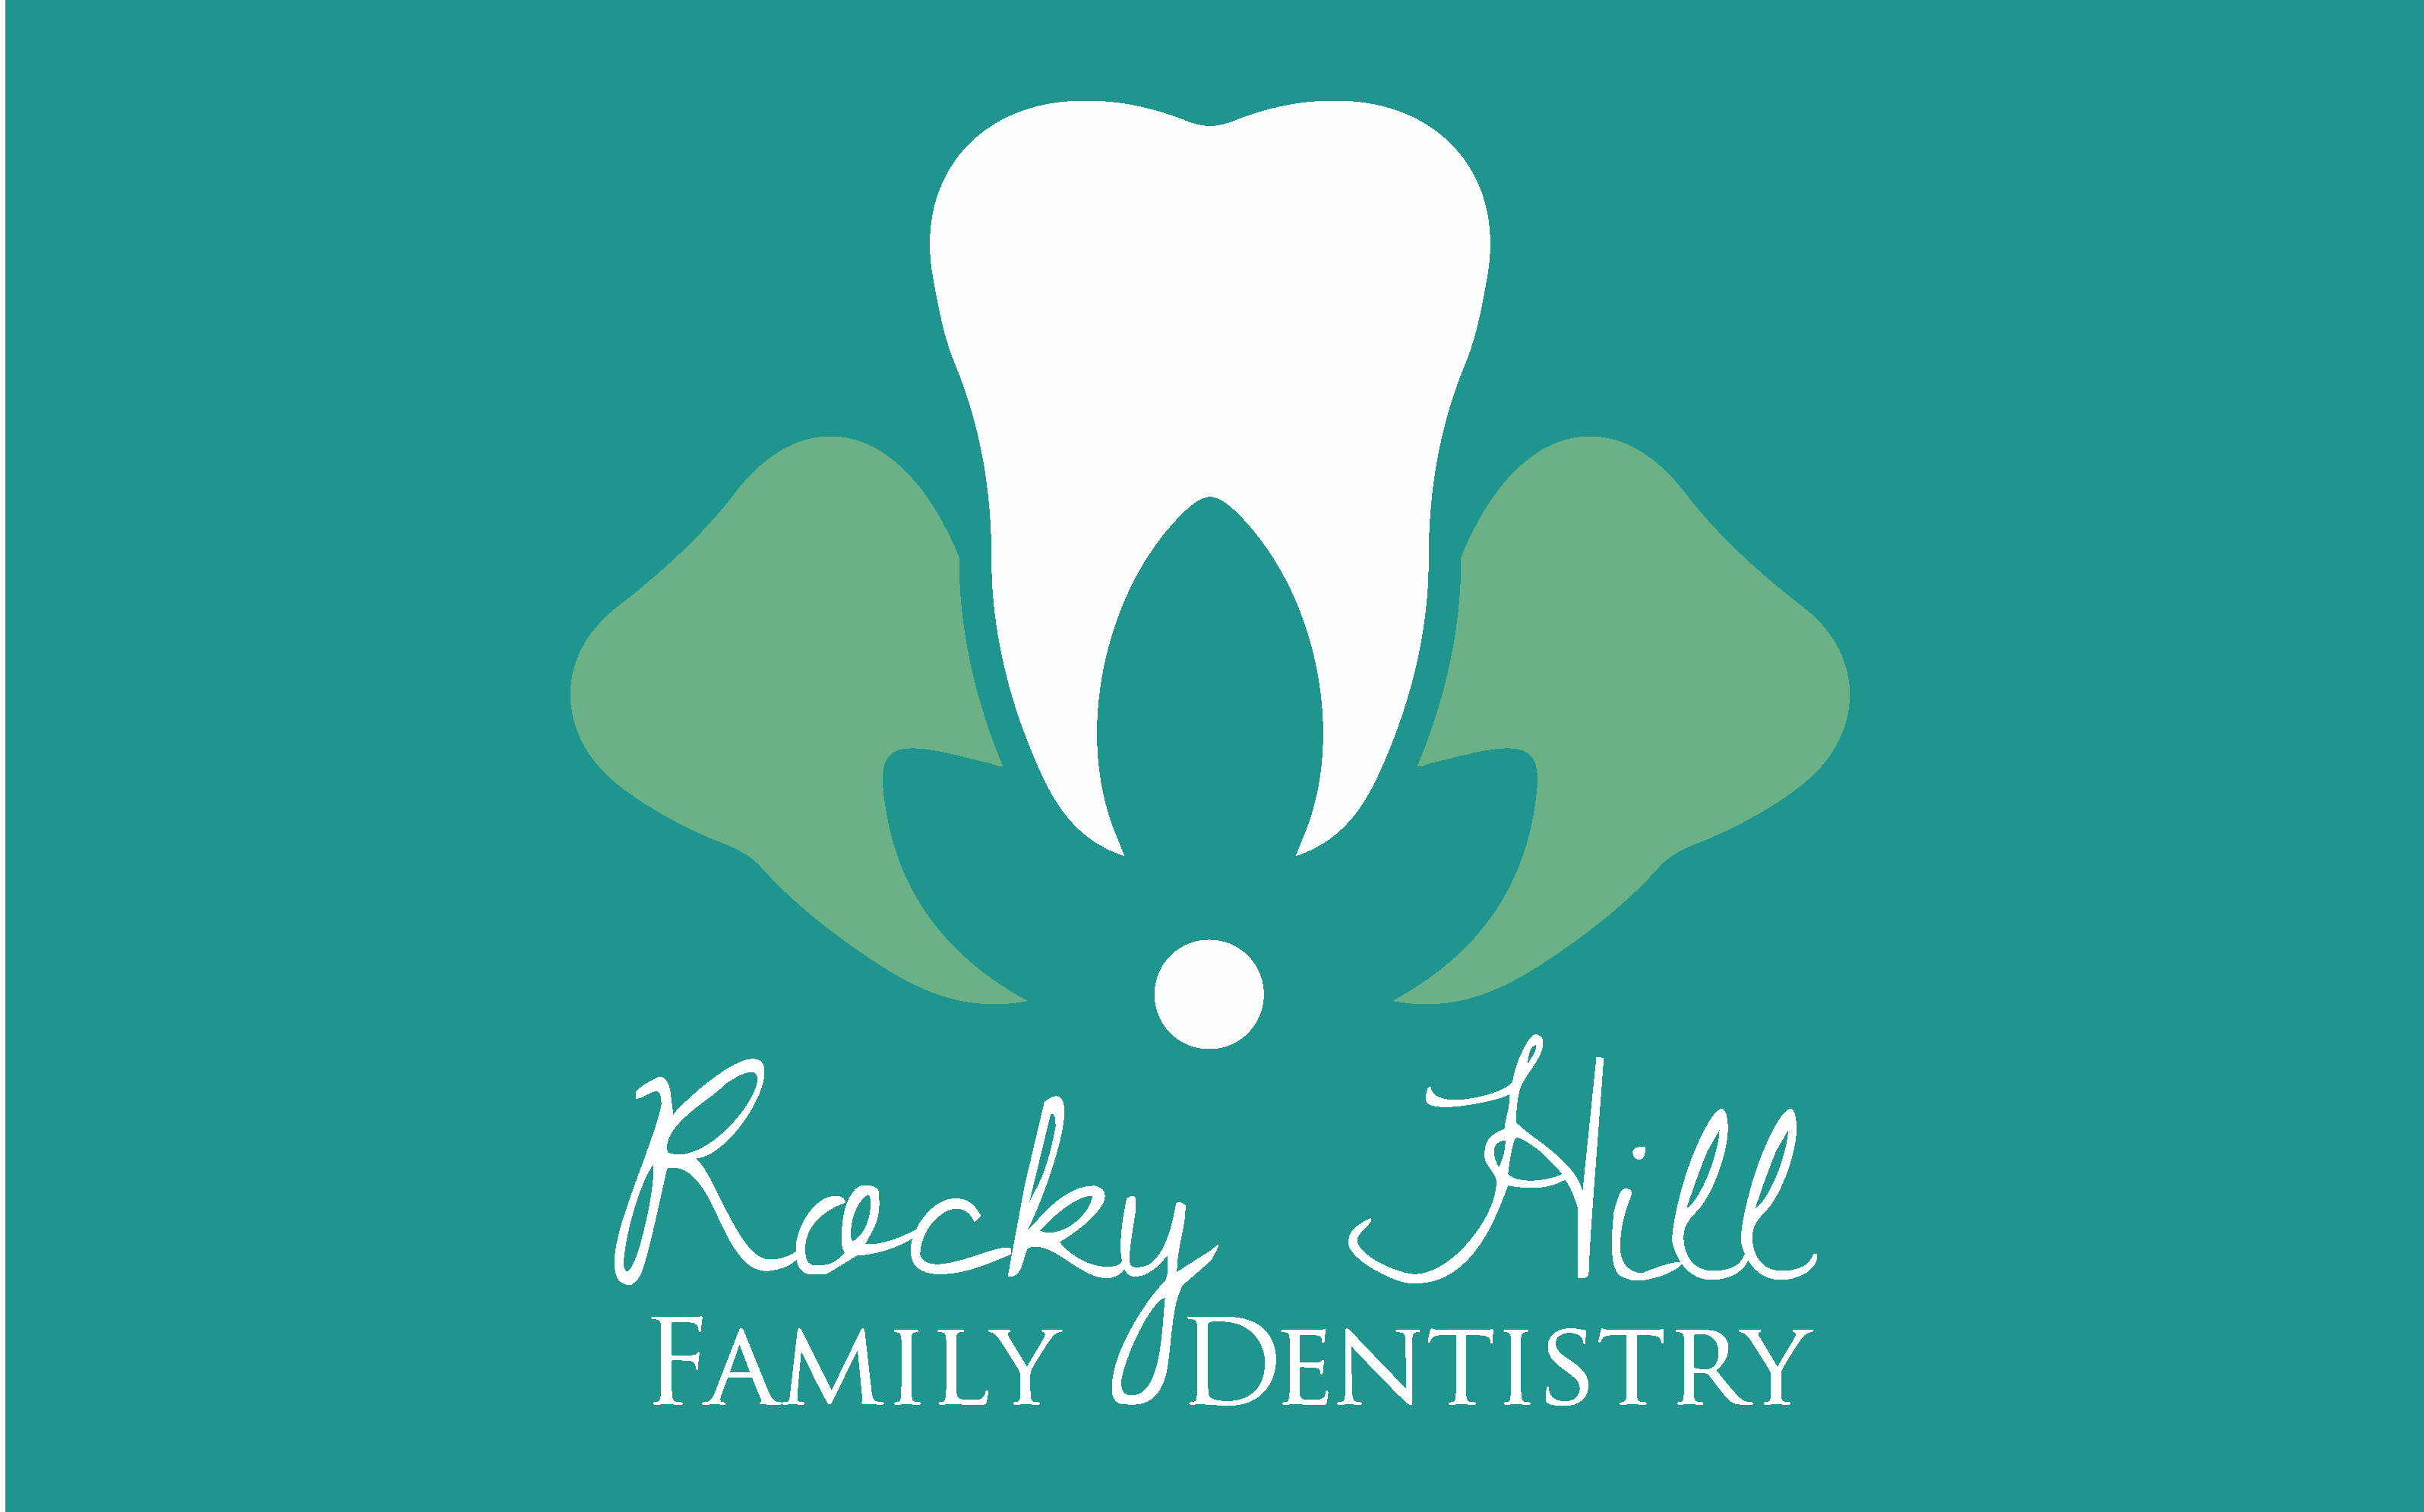 Rocky Hill Family Dentistry